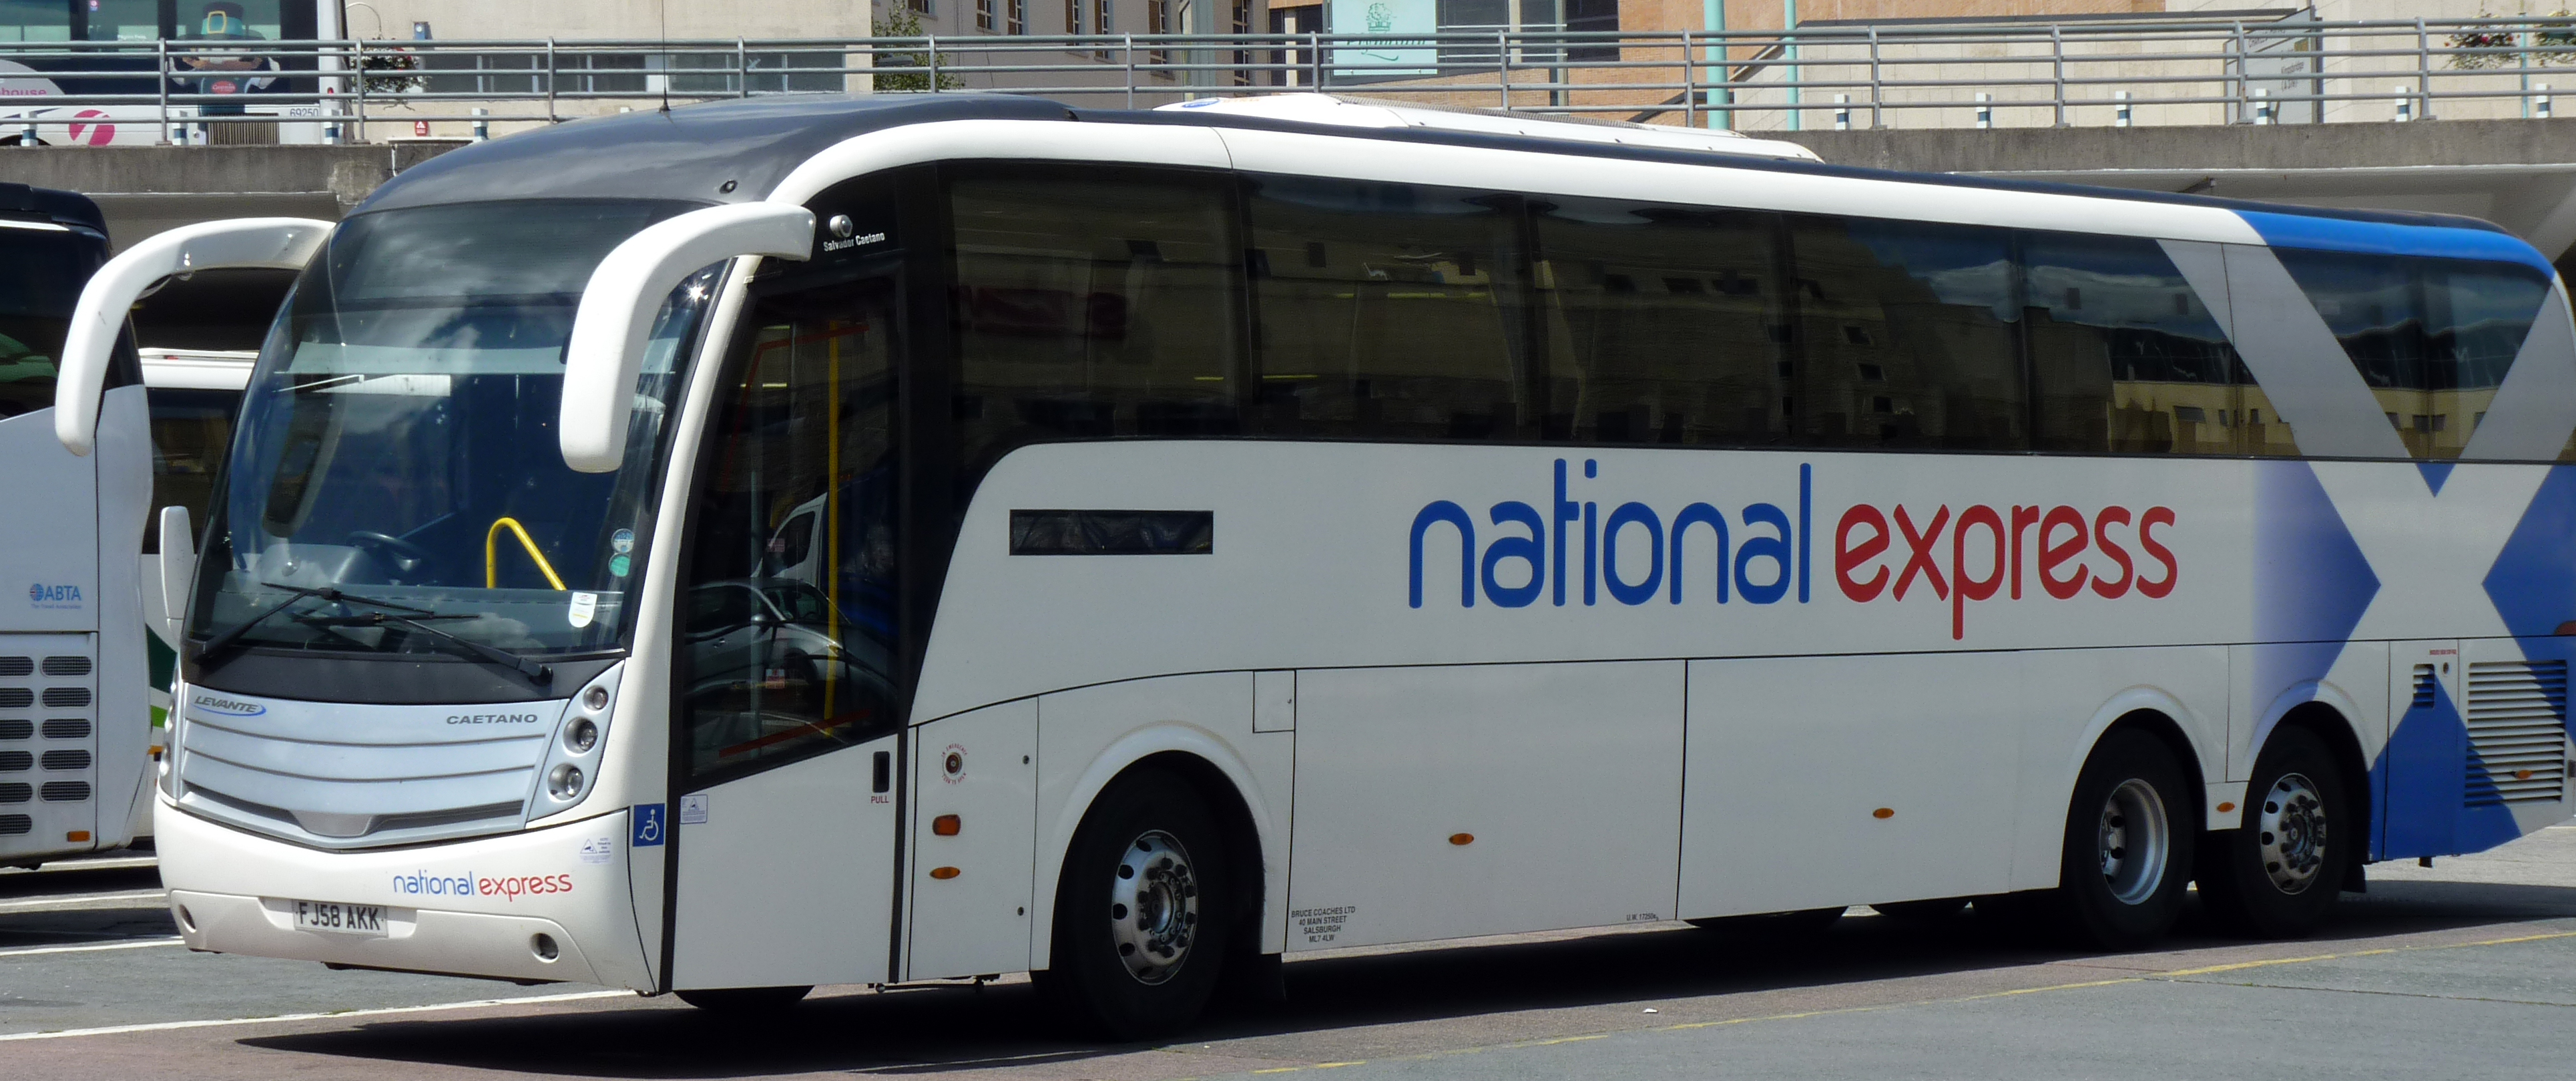 File:Bruce FJ58AKK National Express.jpg - Wikimedia Commons